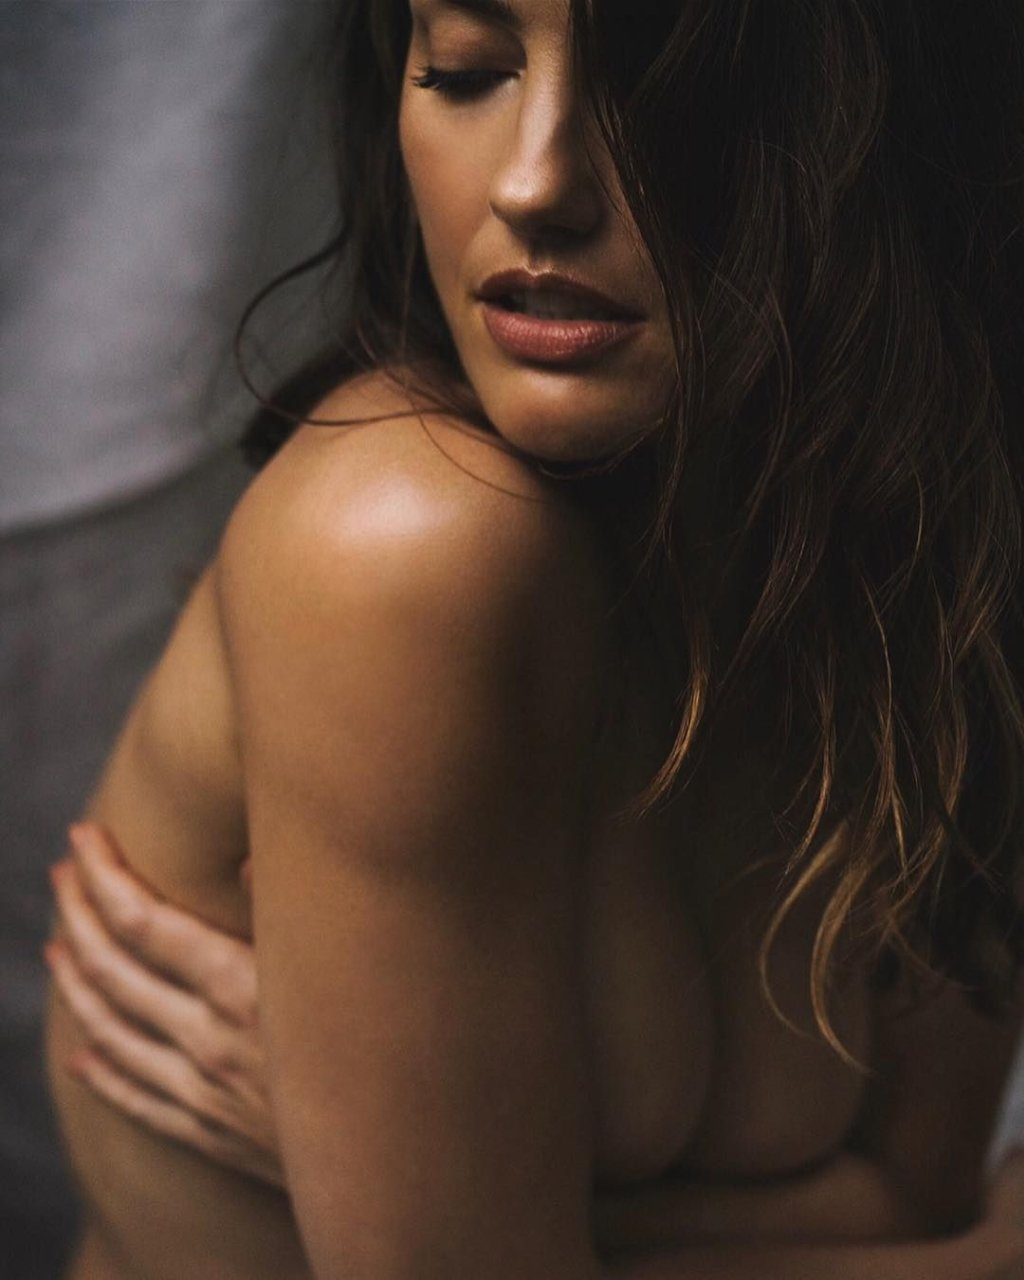 Amanda todd naked photos